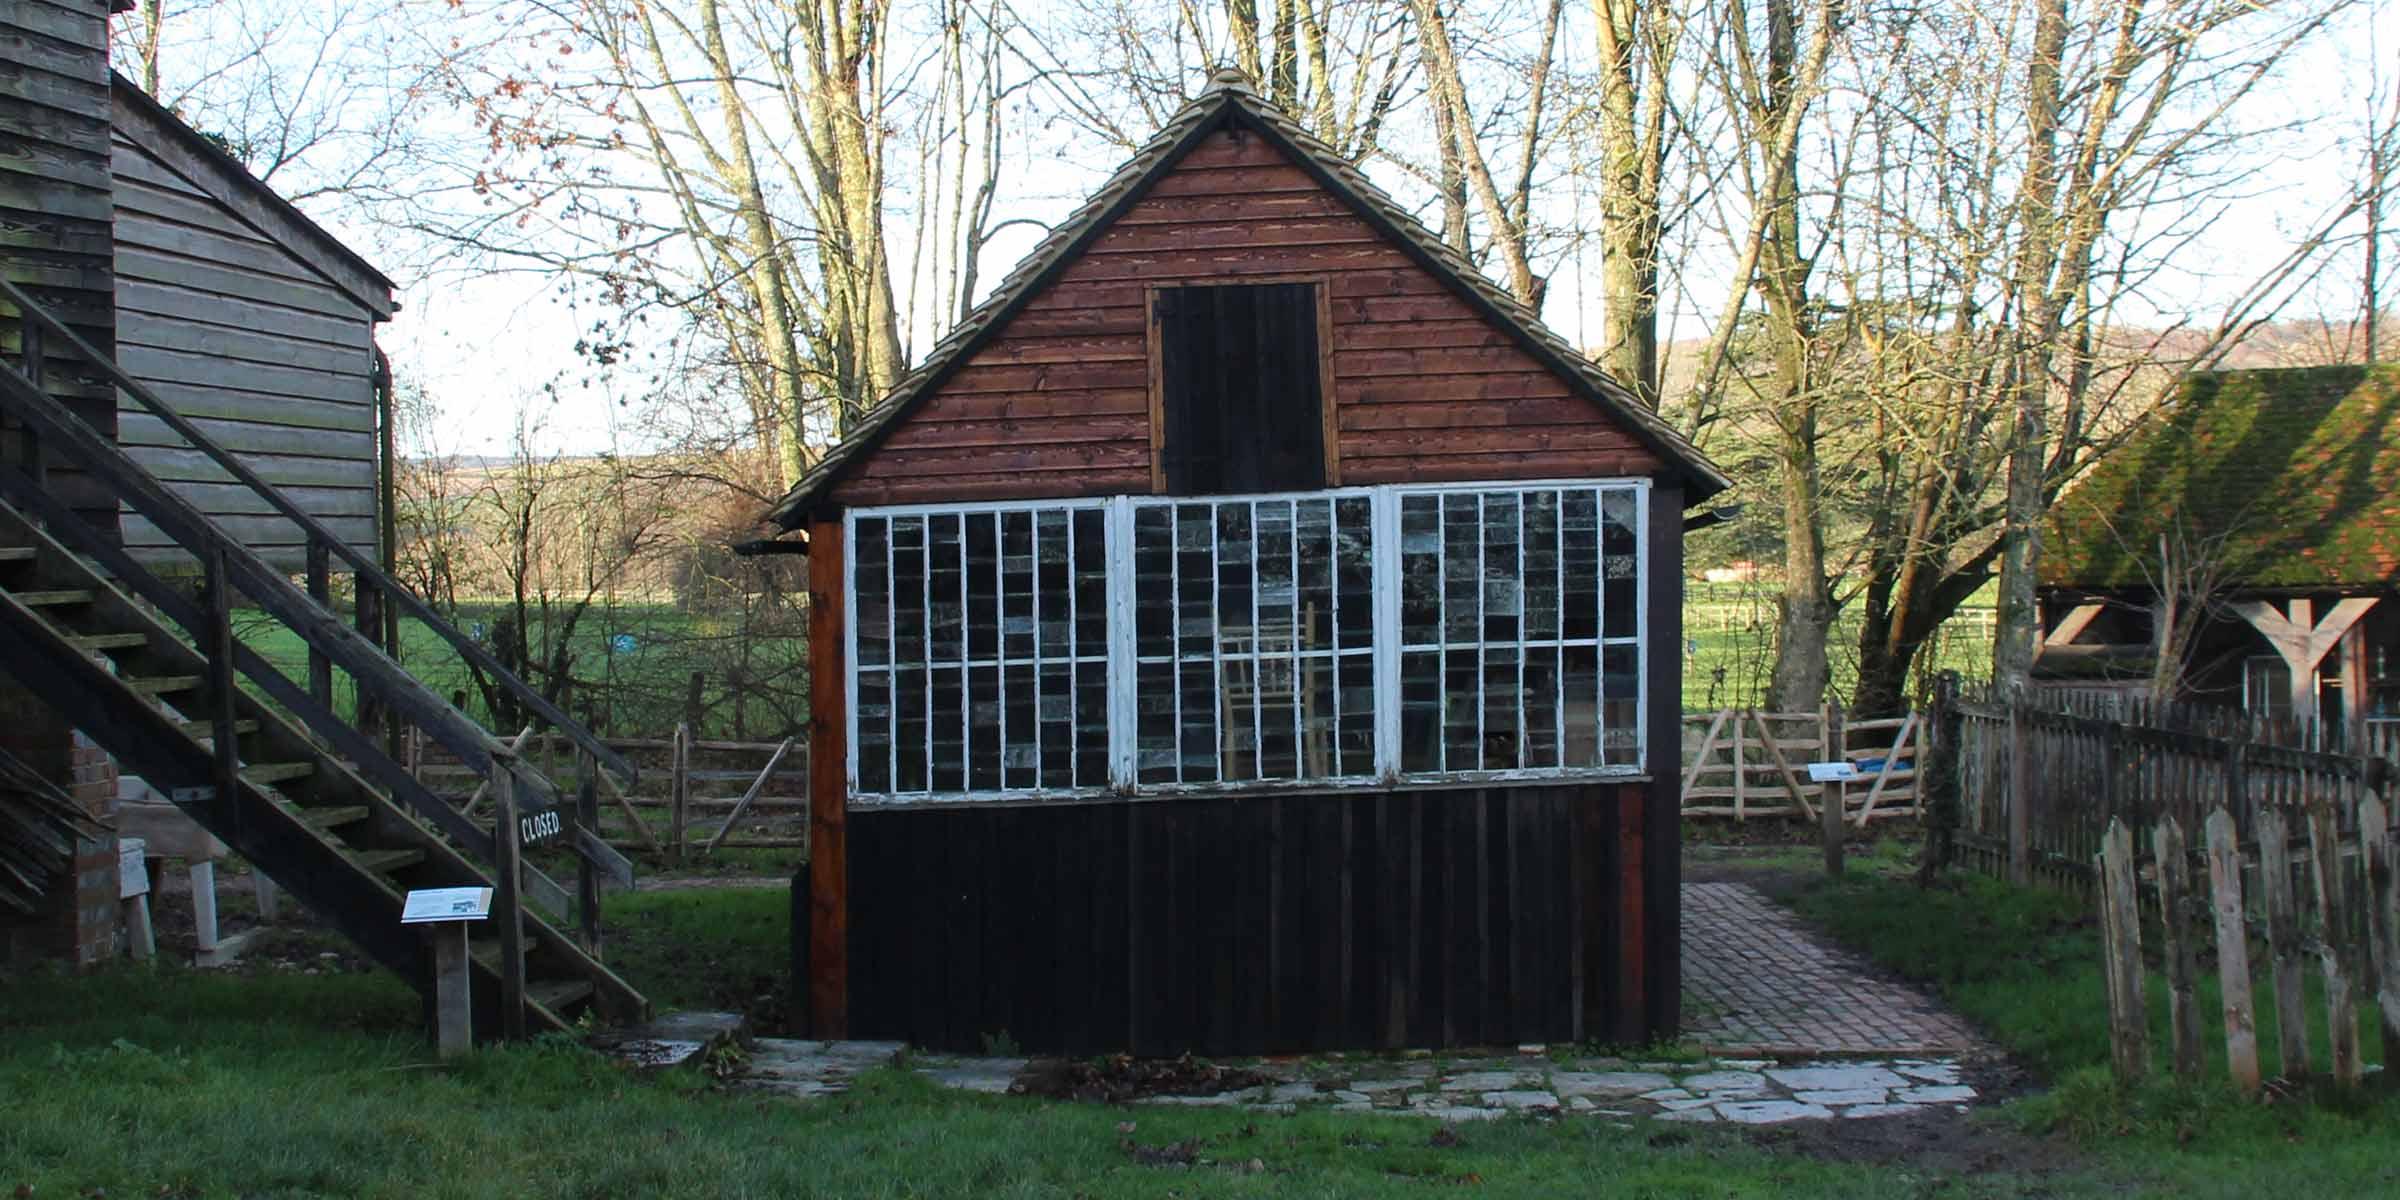 Carpenters shop from Windlesham